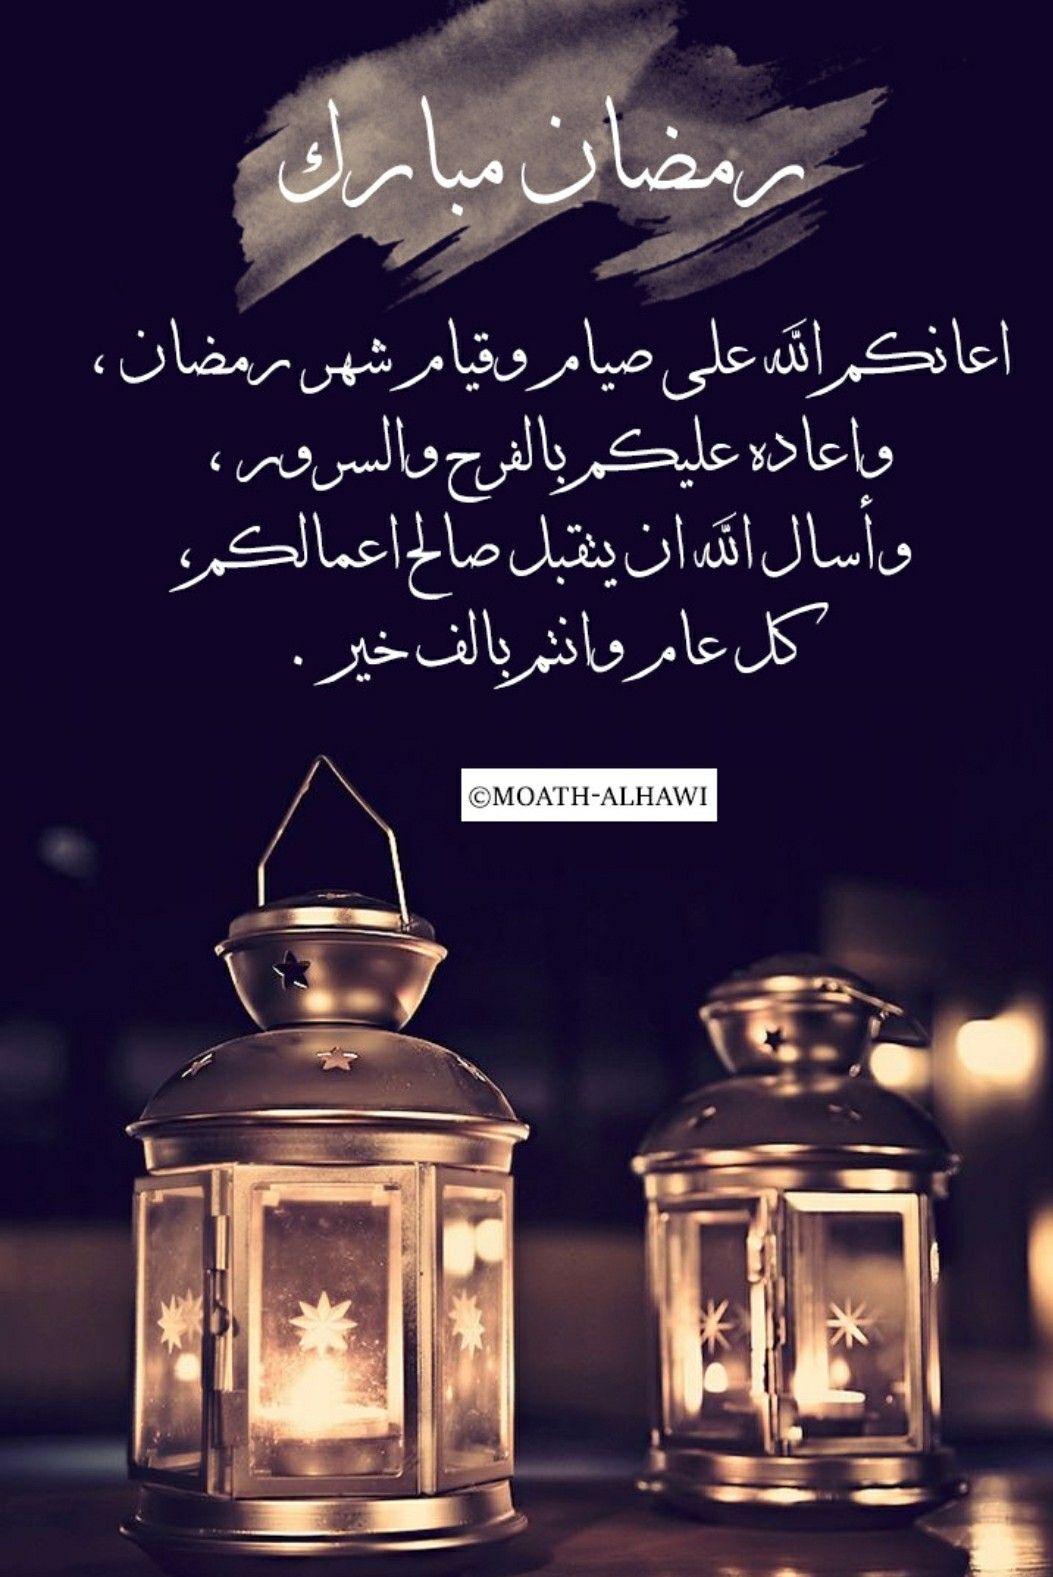 Pin By مبروك مهران On رمضان كريم Ramadan Cards Ramadan Wishes Ramadan Kareem